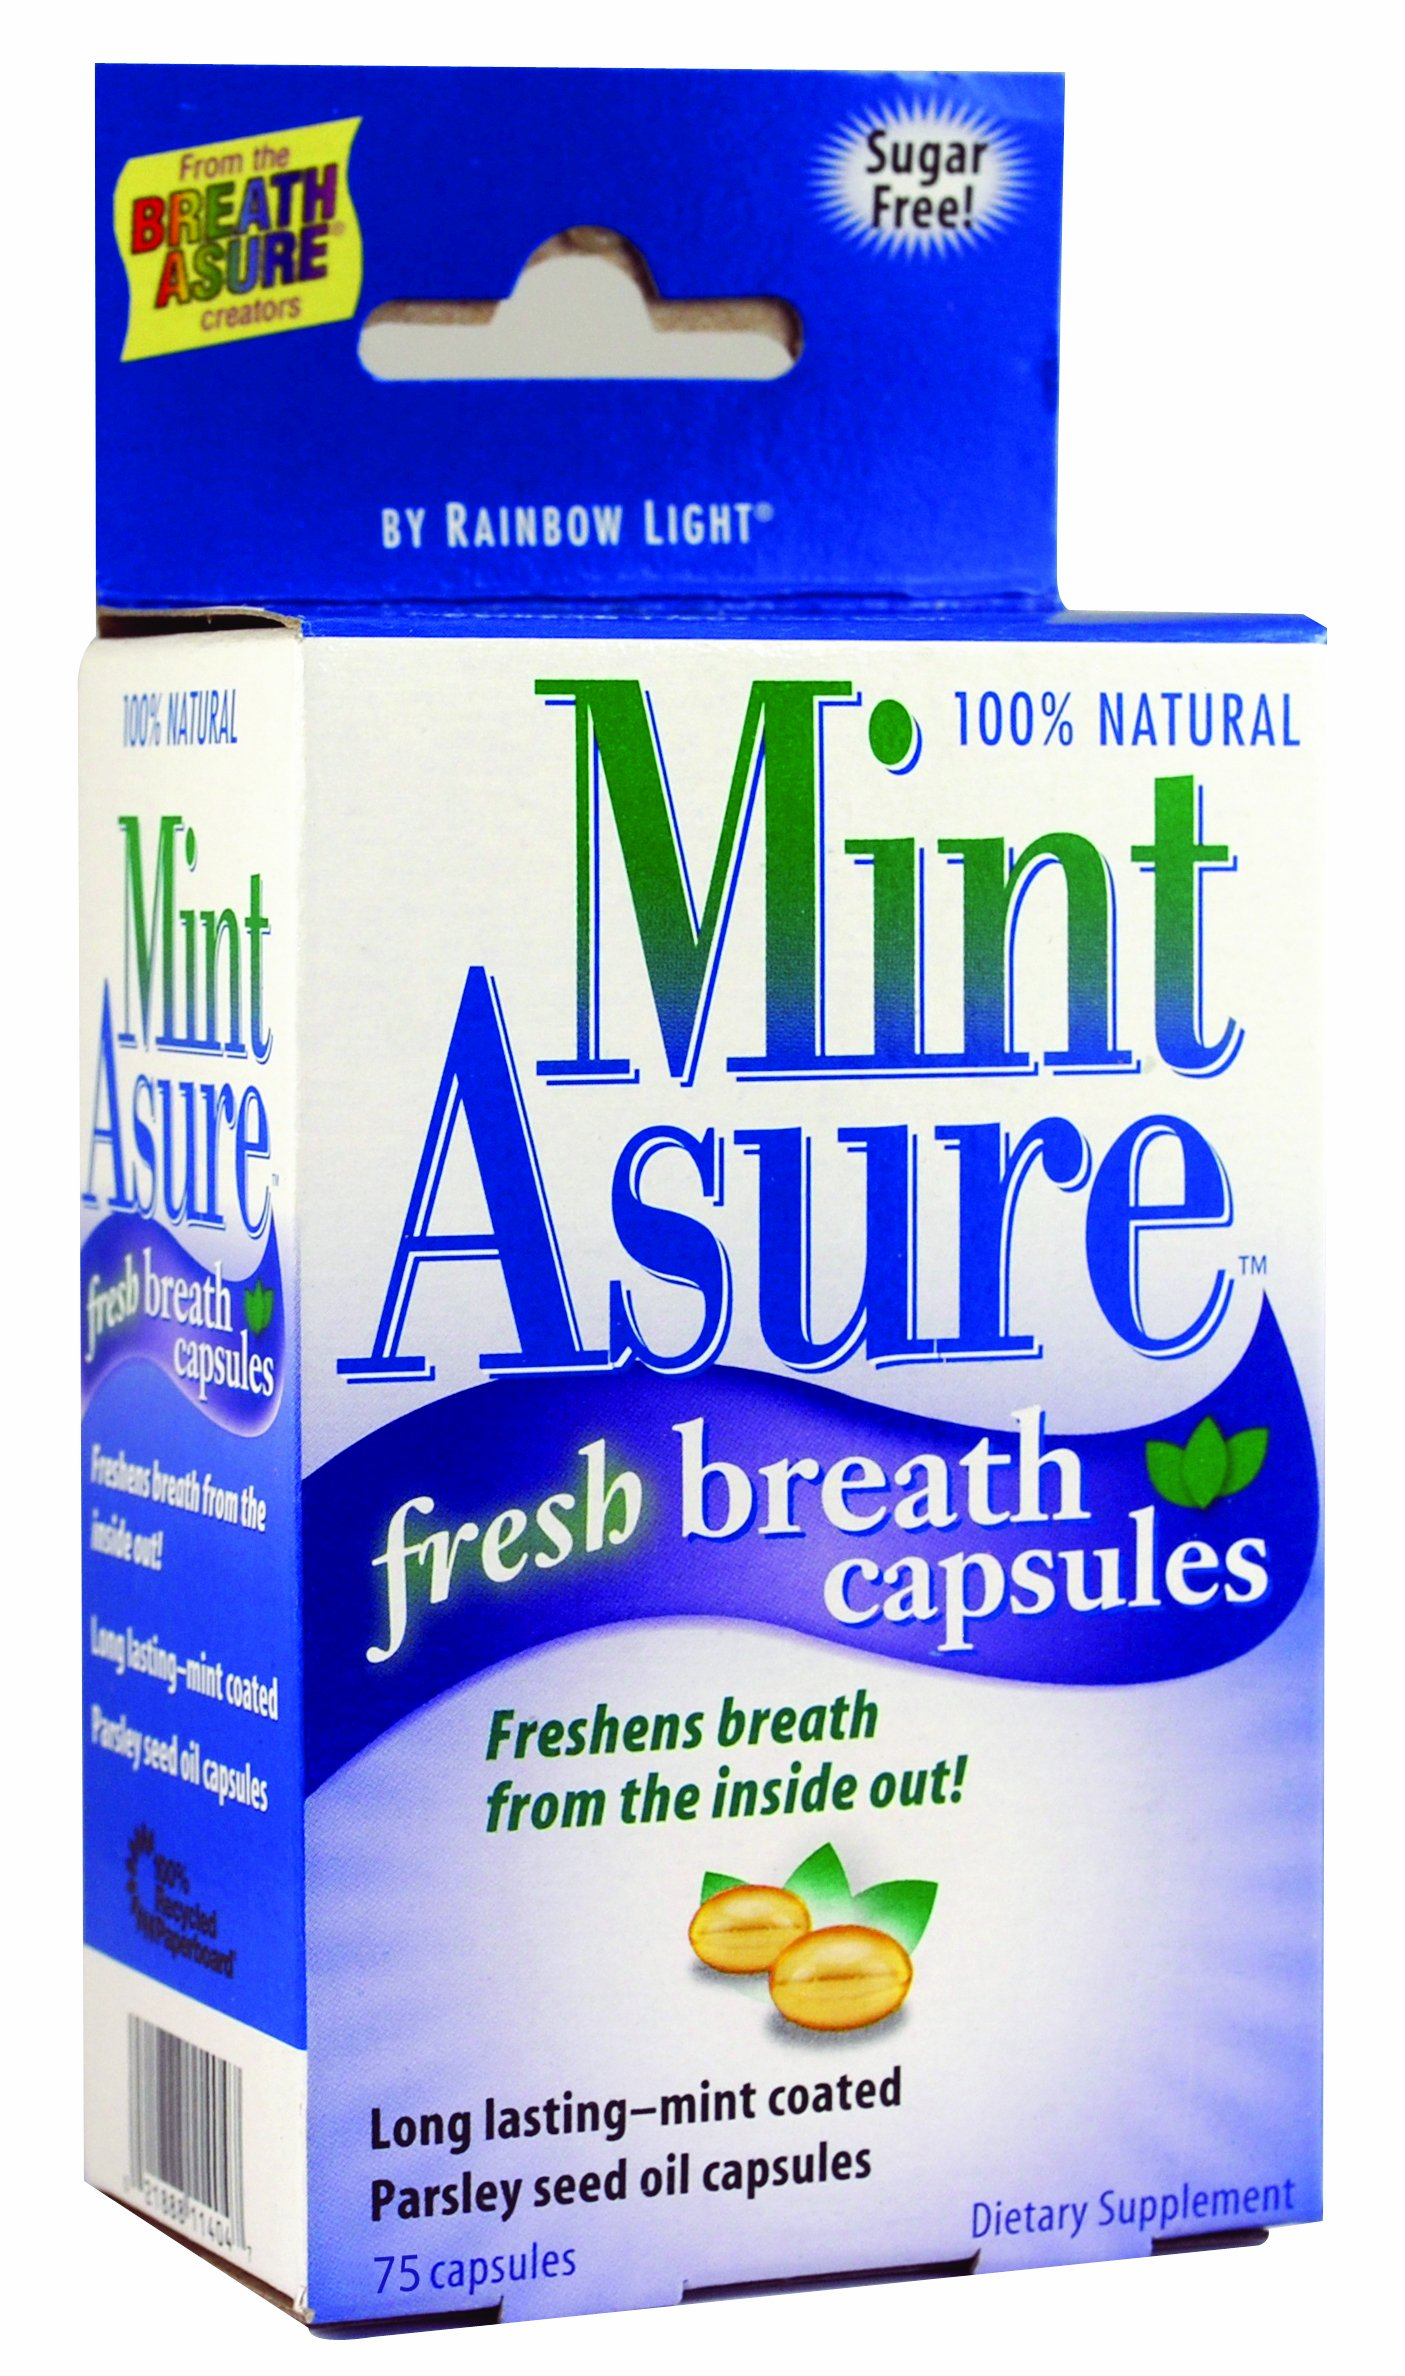 MintAsure Fresh Breath Capsules Mint-coated 75 capsules (Pack of 6)